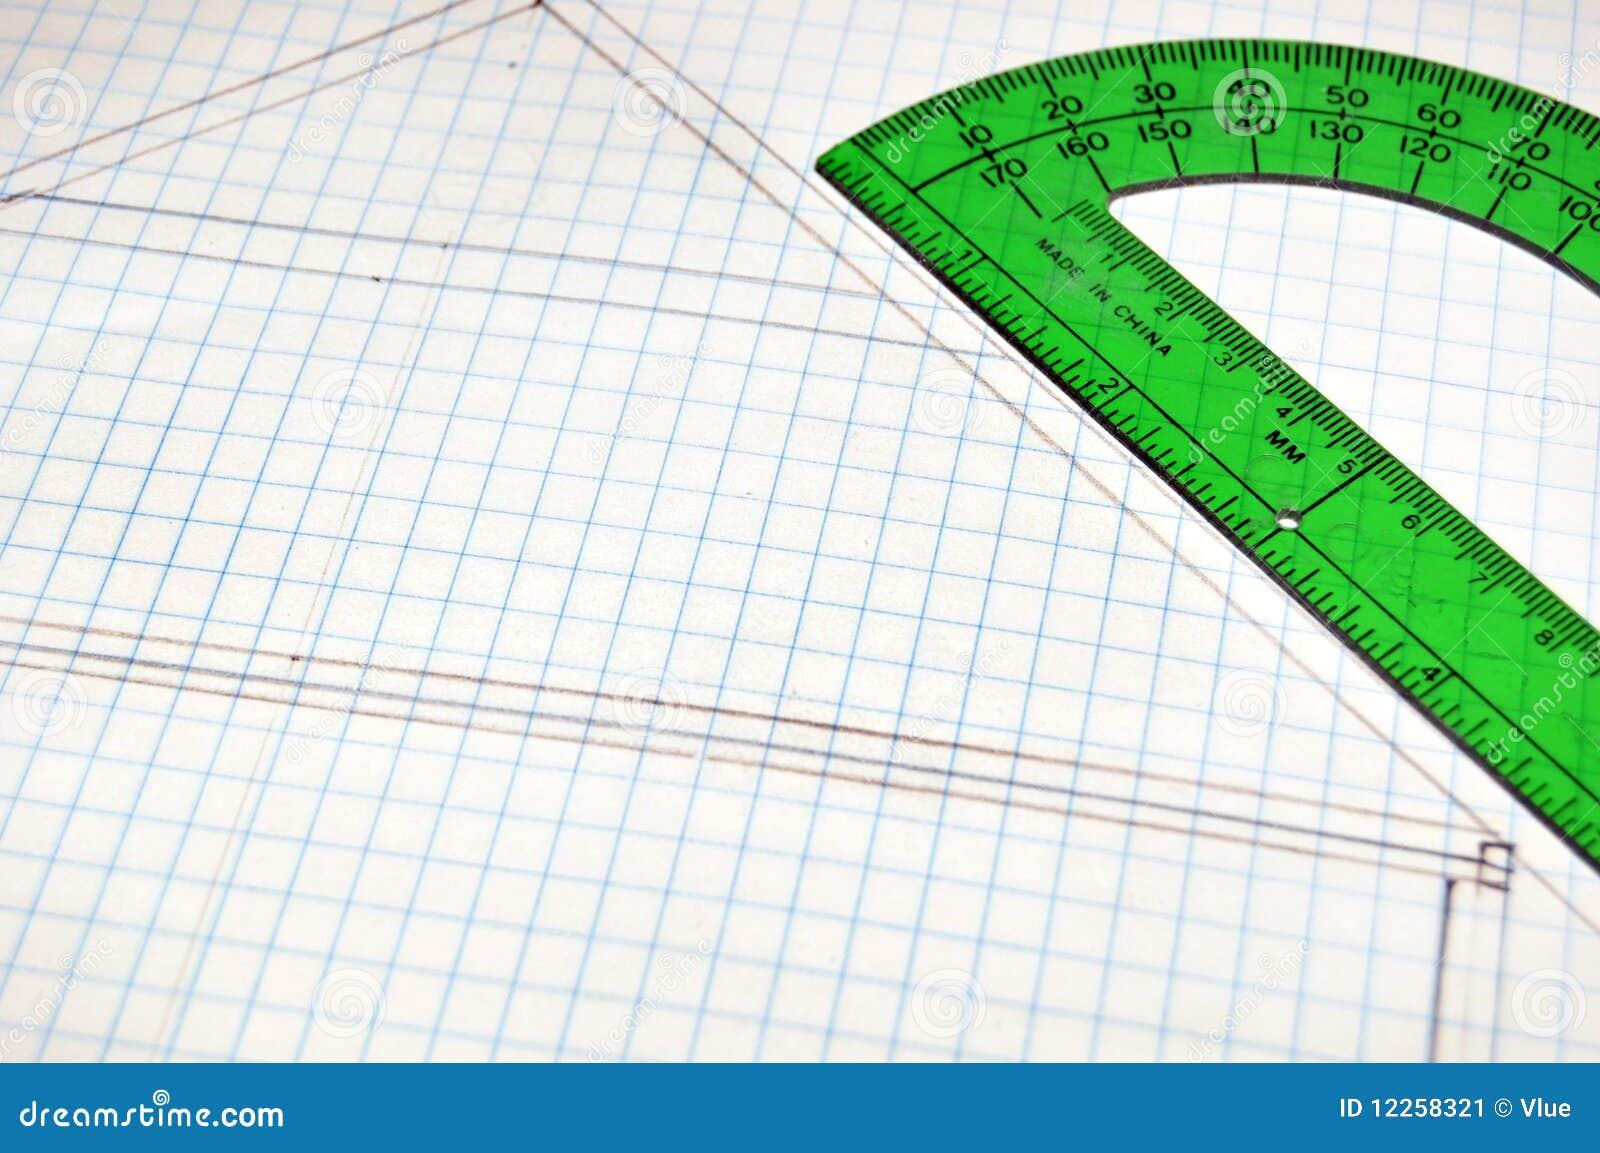 Design grid paper floor plans grid paper 12258321jpg floor plan design